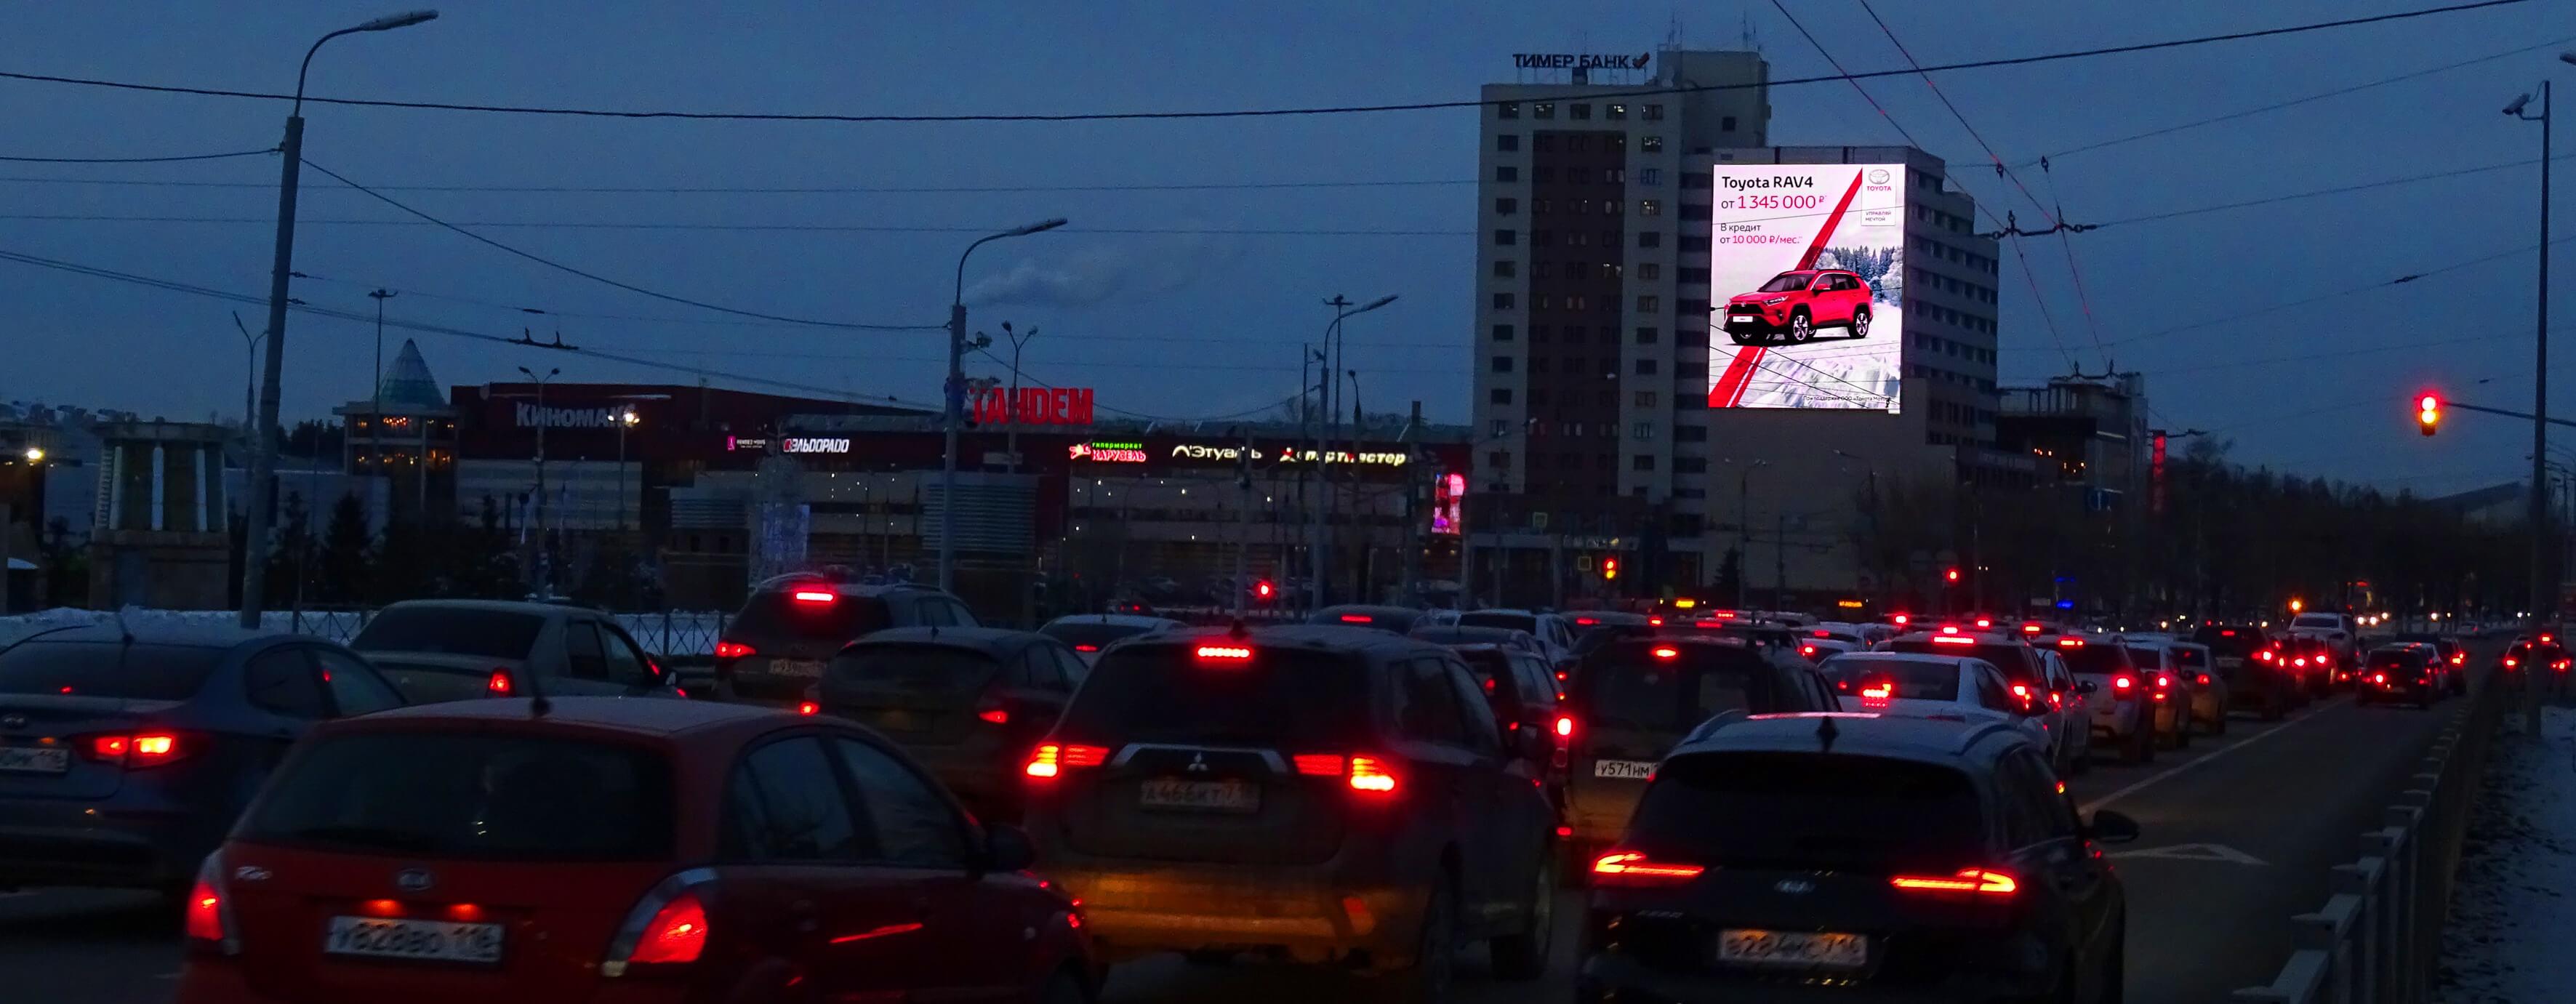 Реклама на медиафасаде